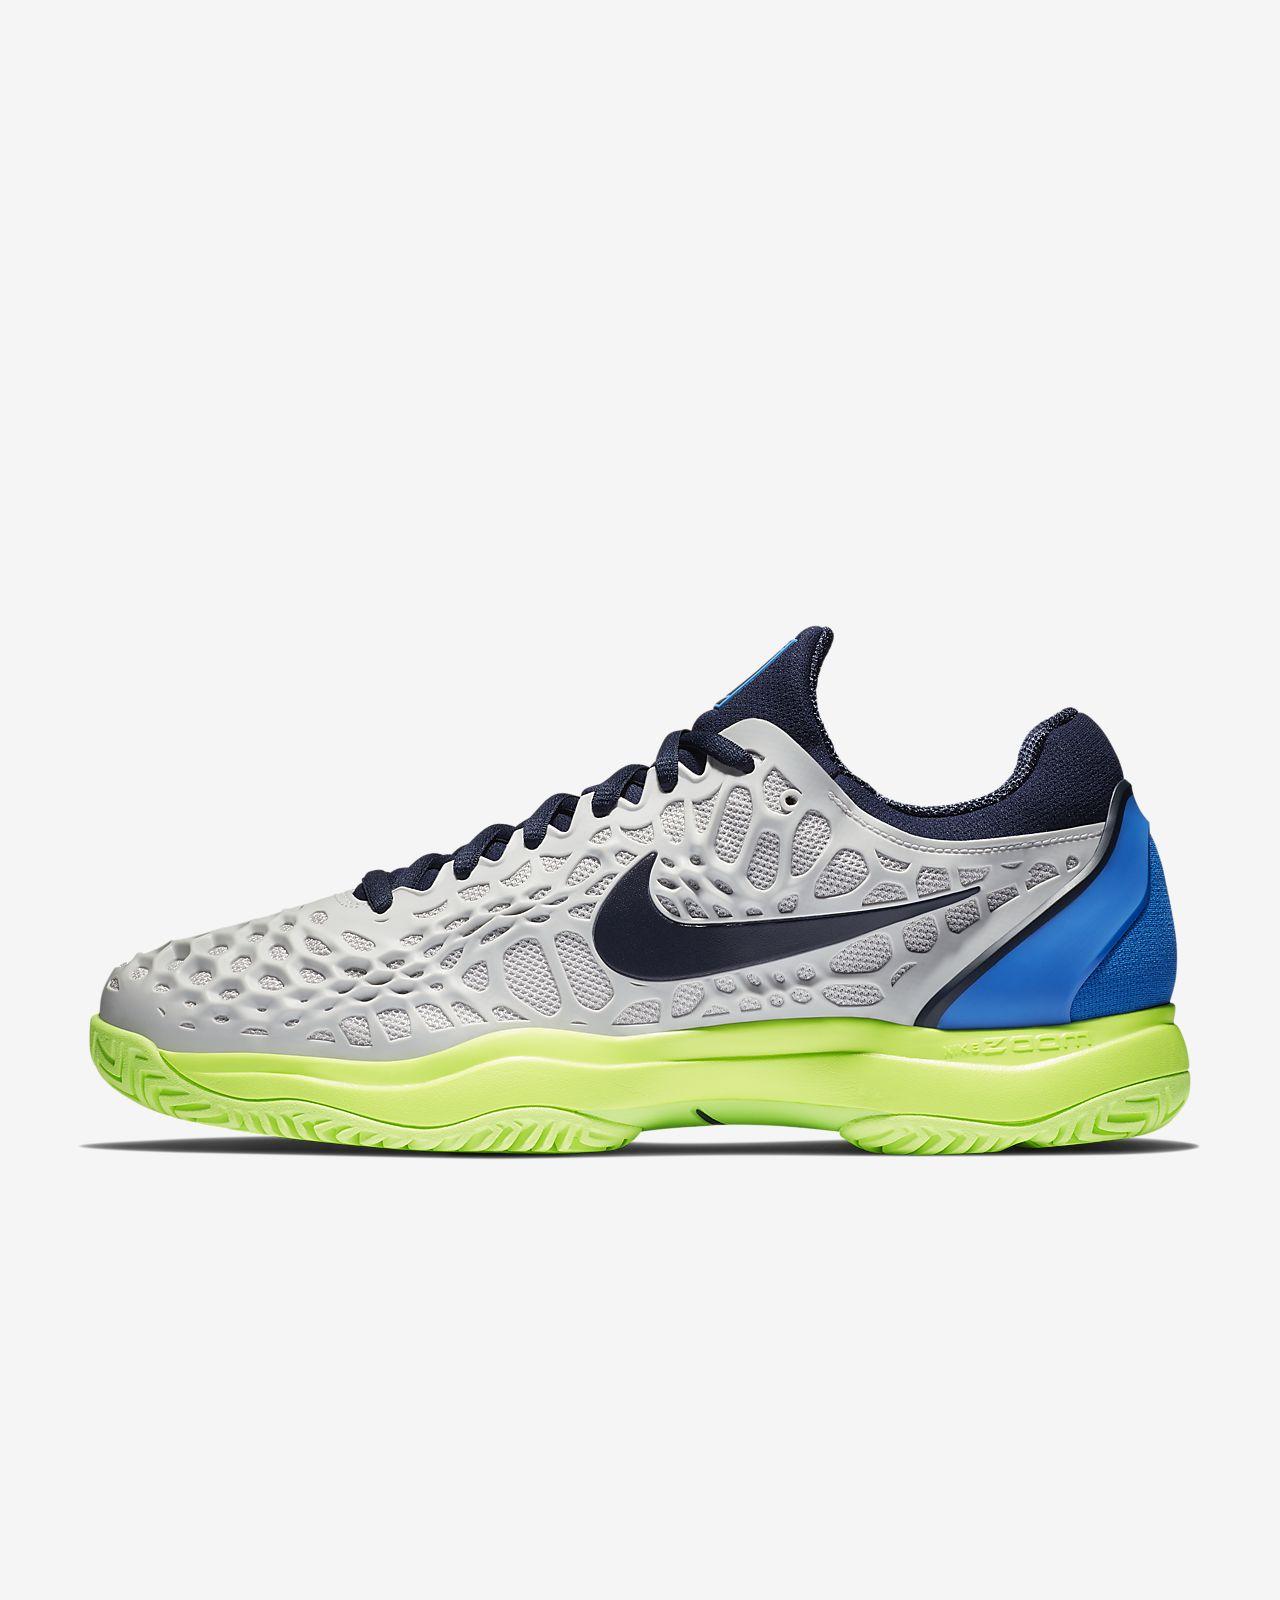 promo code 8b6e3 34976 NikeCourt Zoom Cage 3 Herren-Tennisschuh für Hartplätze. Nike.com DE